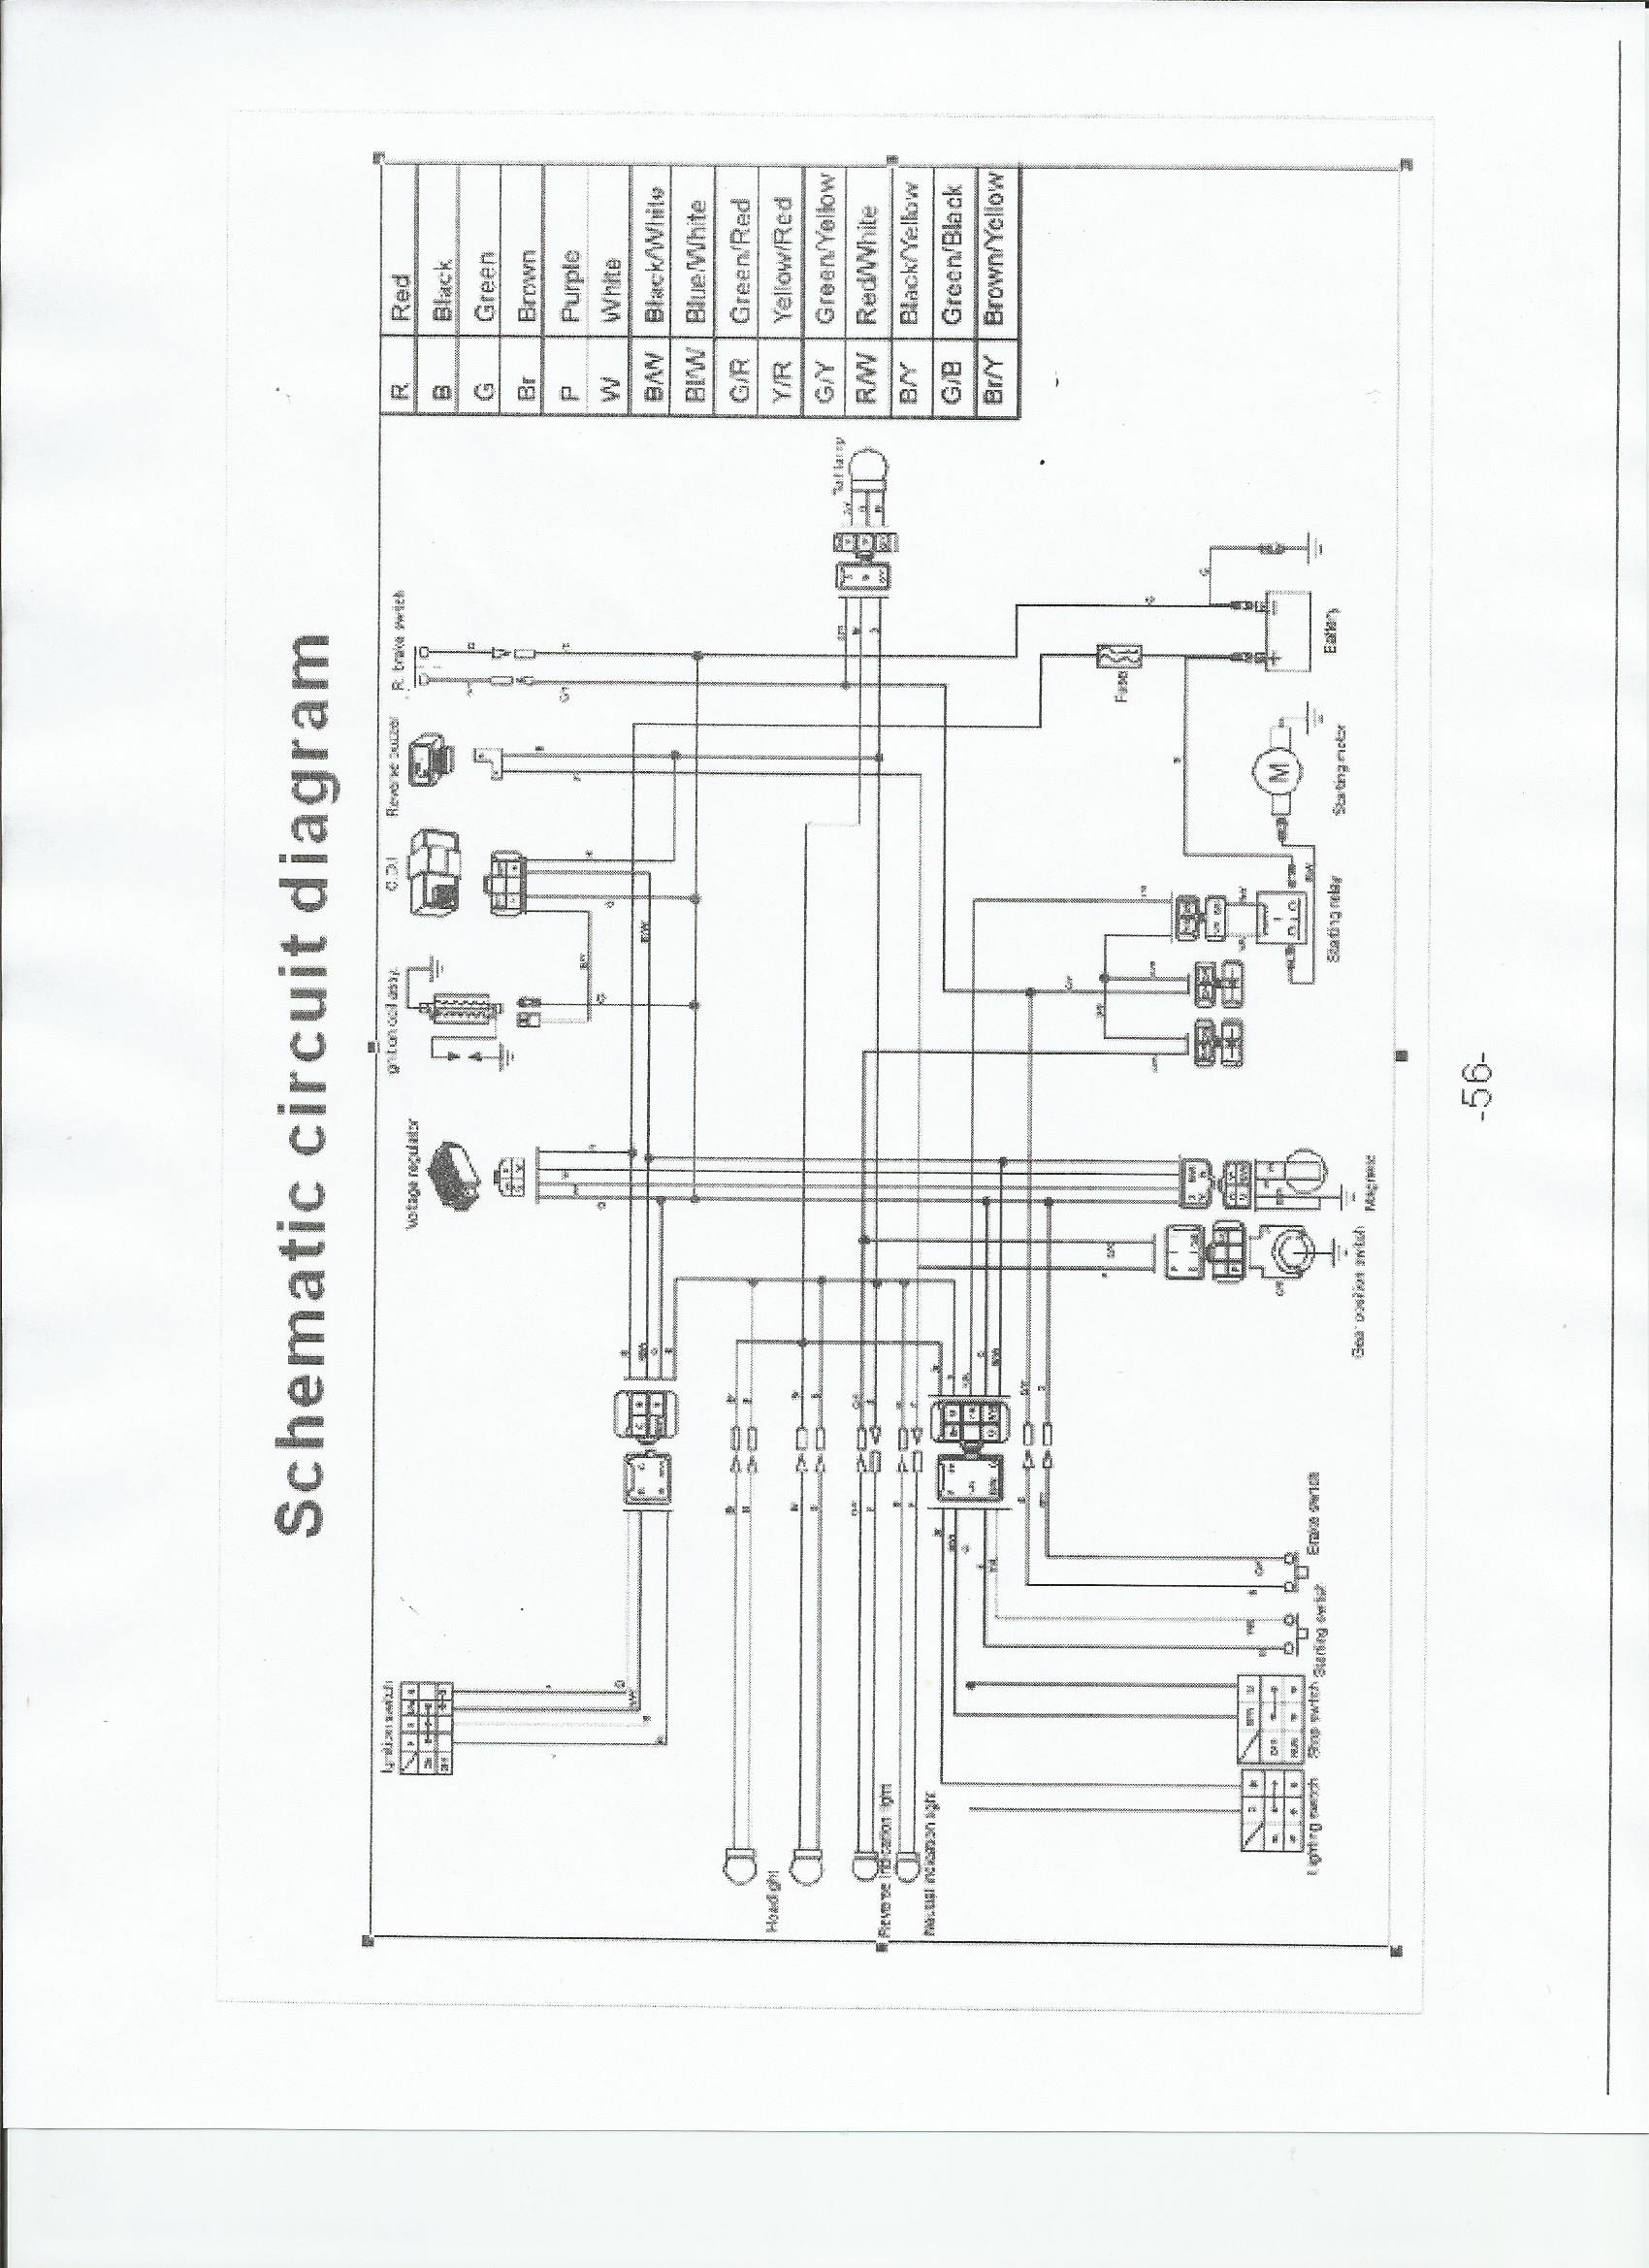 hight resolution of taotao mini and youth atv wiring schematic familygokarts support tao tao engine diagram tao tao 125 wiring diagram